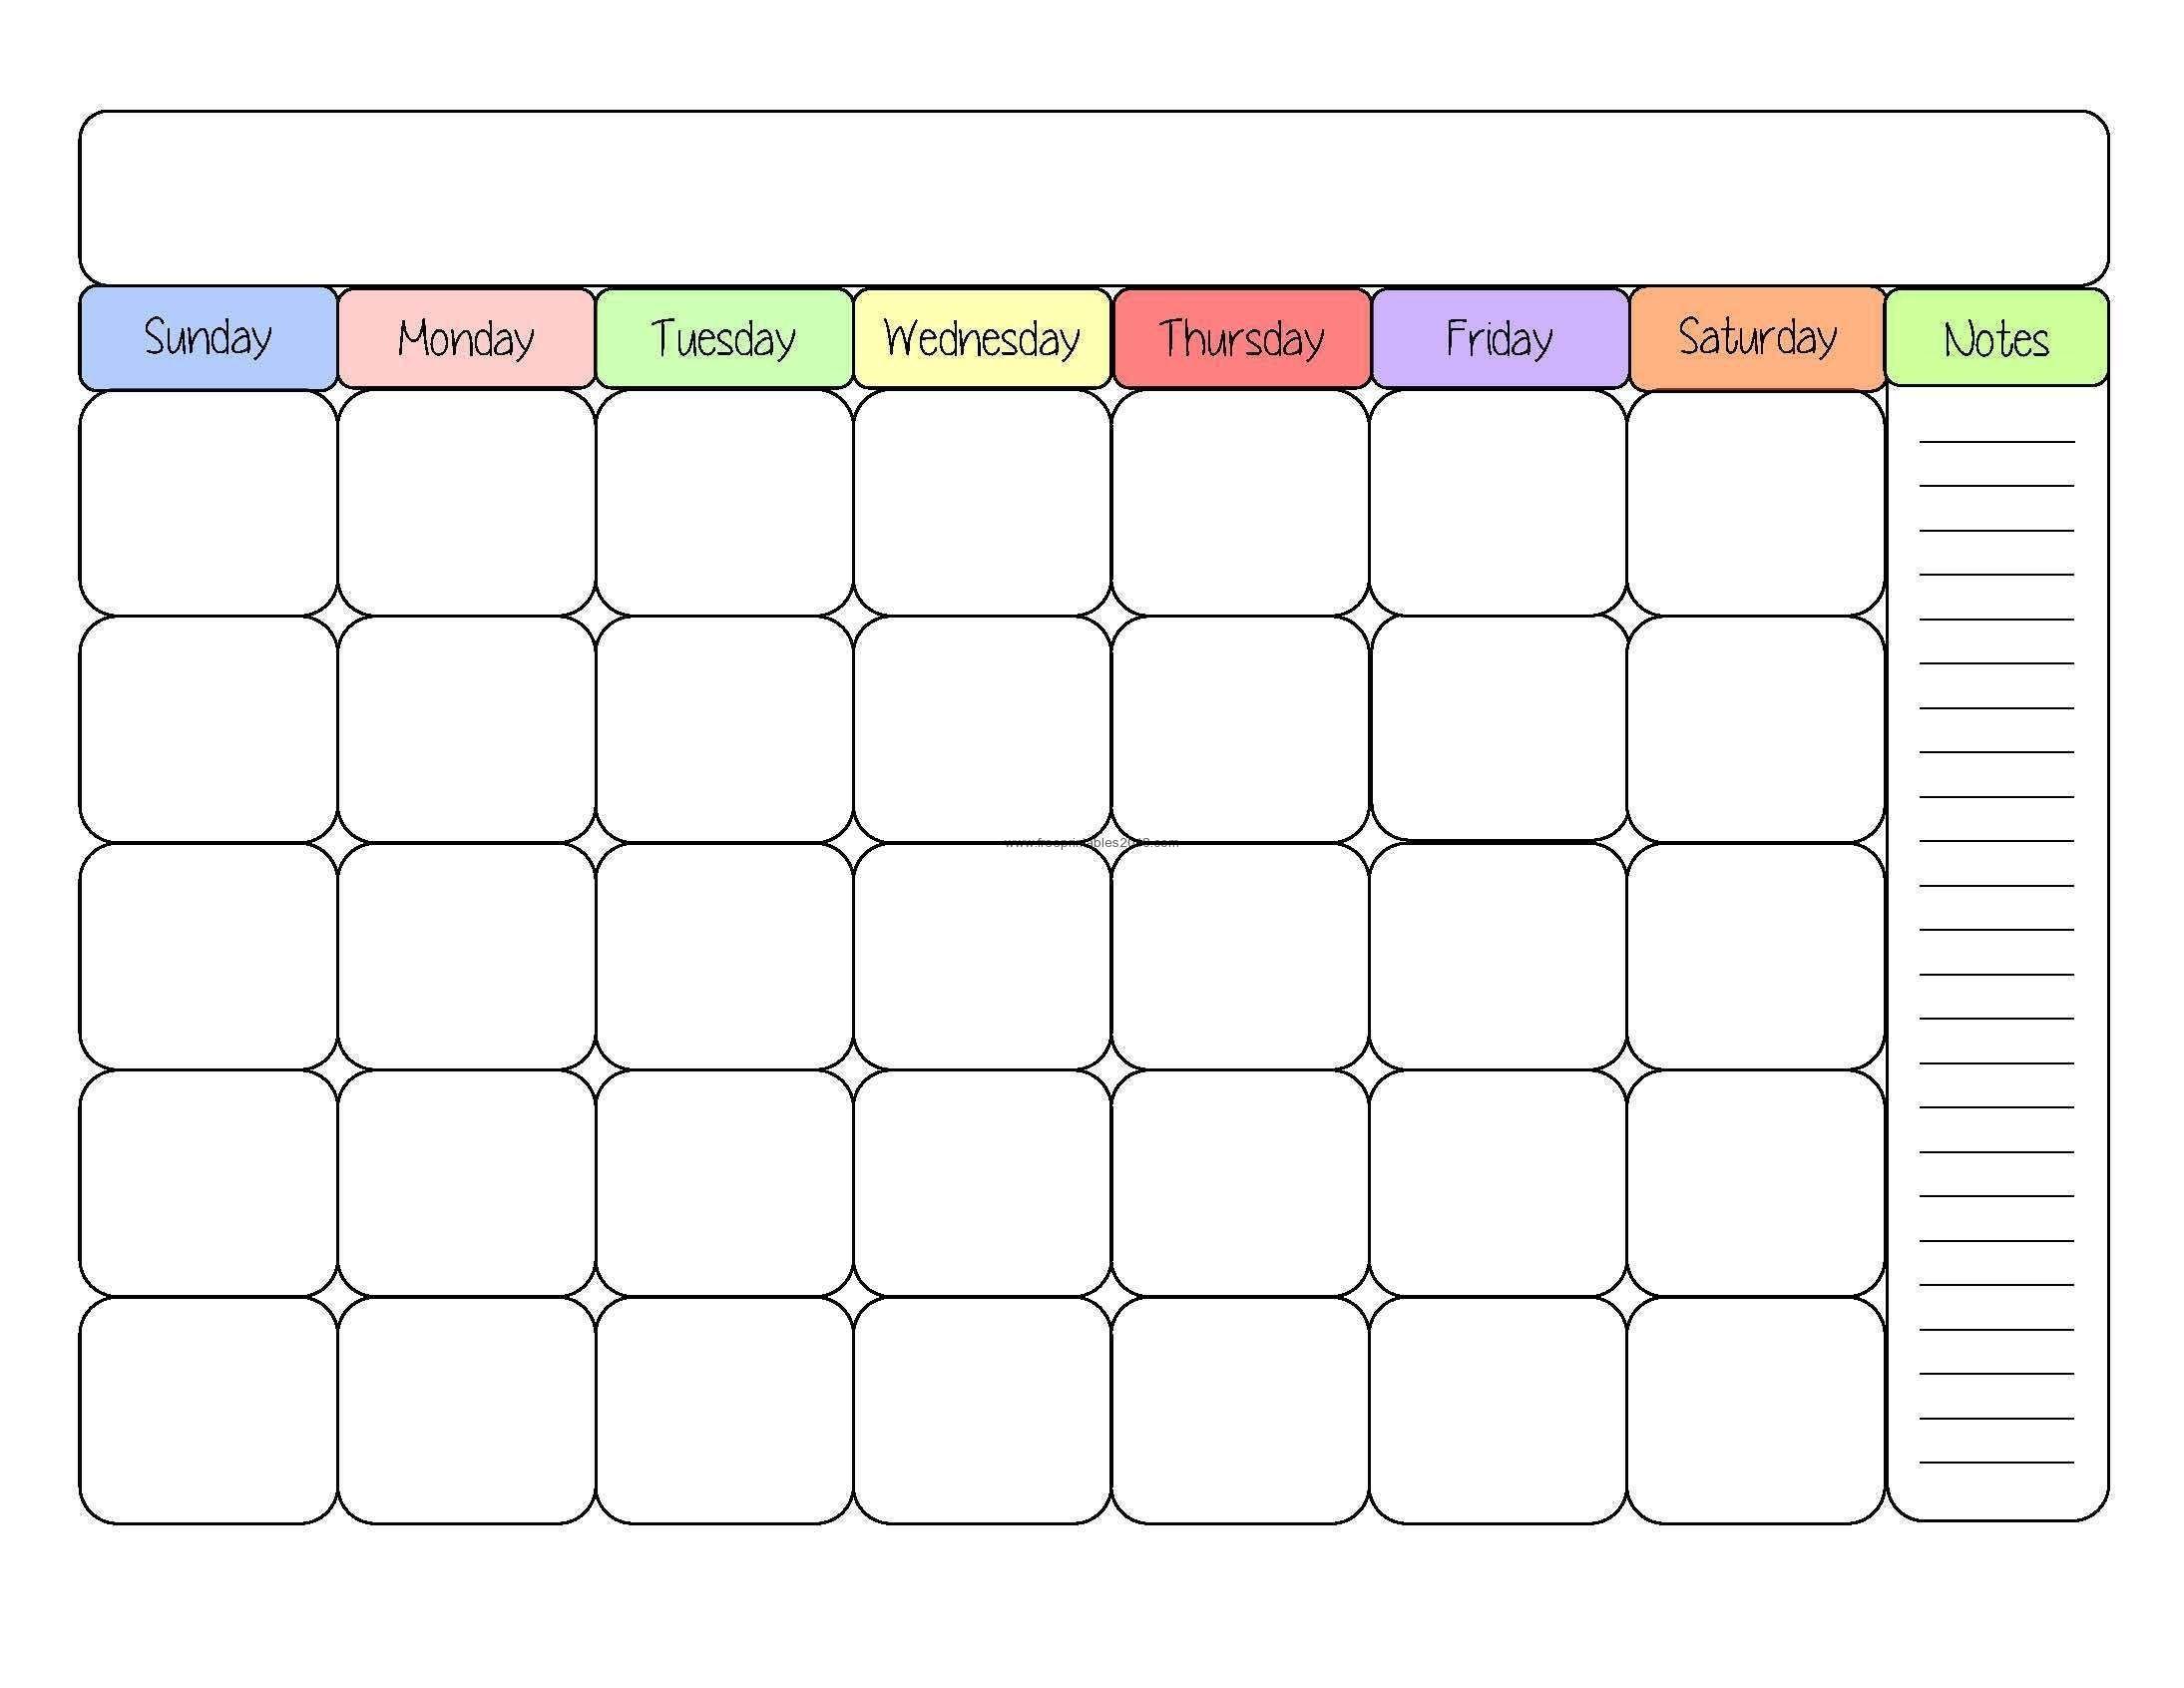 Free Printable Calendar No Download Printable Calendar No Download with Free Printable Blank Calendars